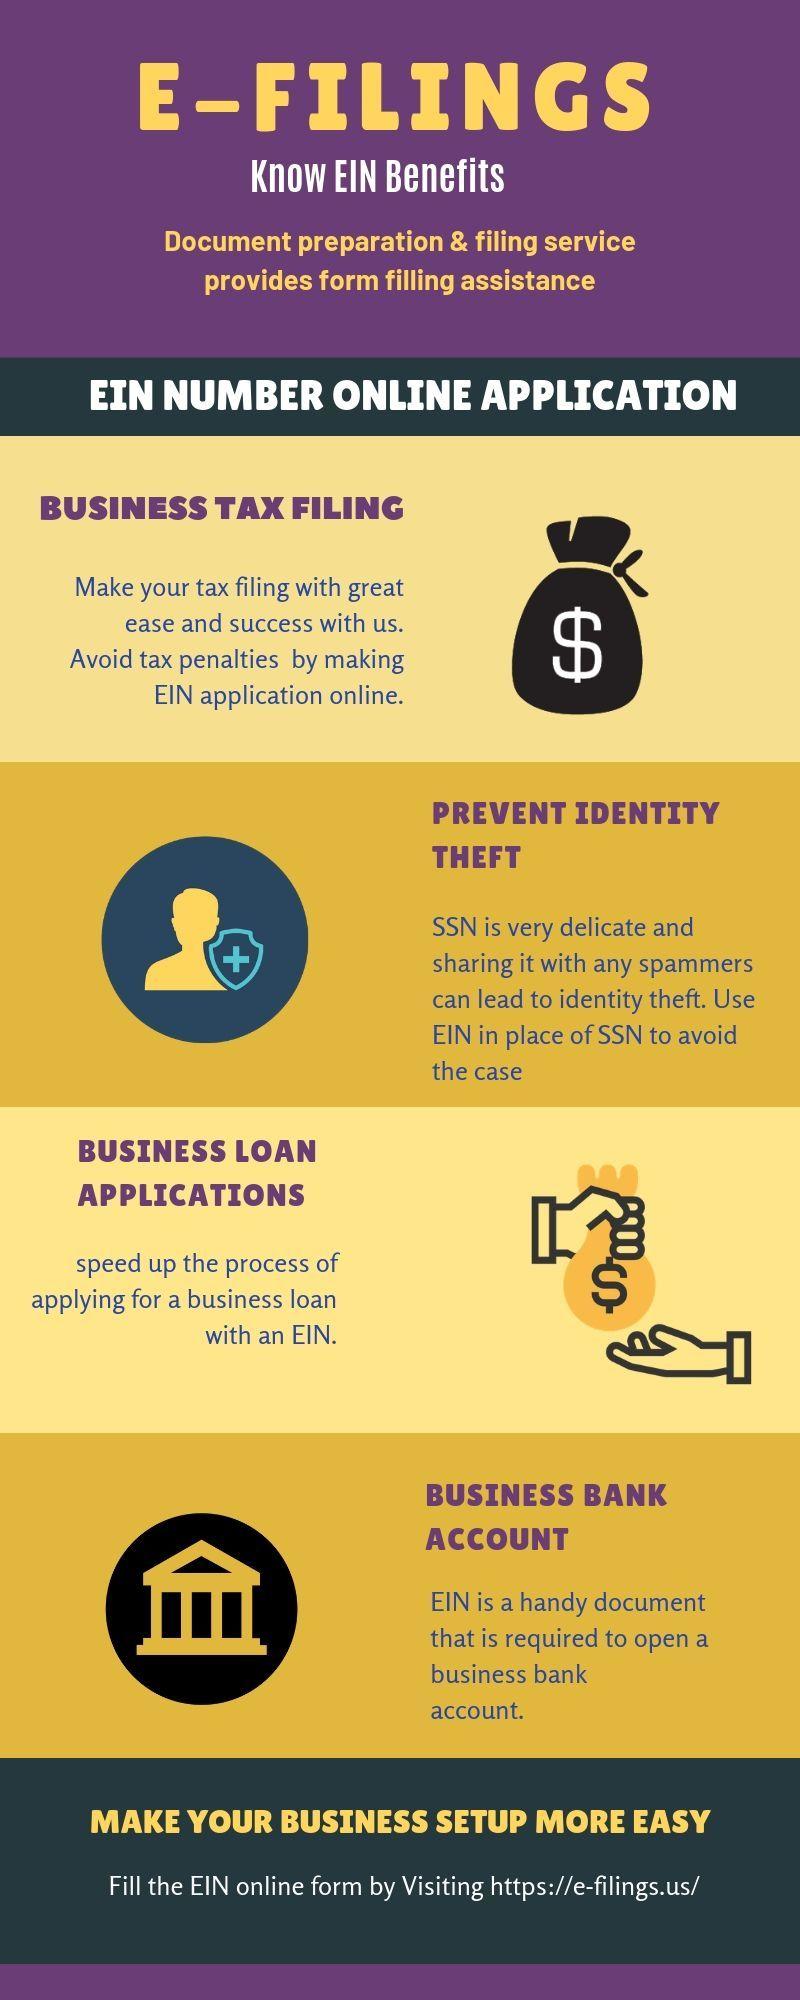 EIN Number Online Application Make Easy Tax Returns